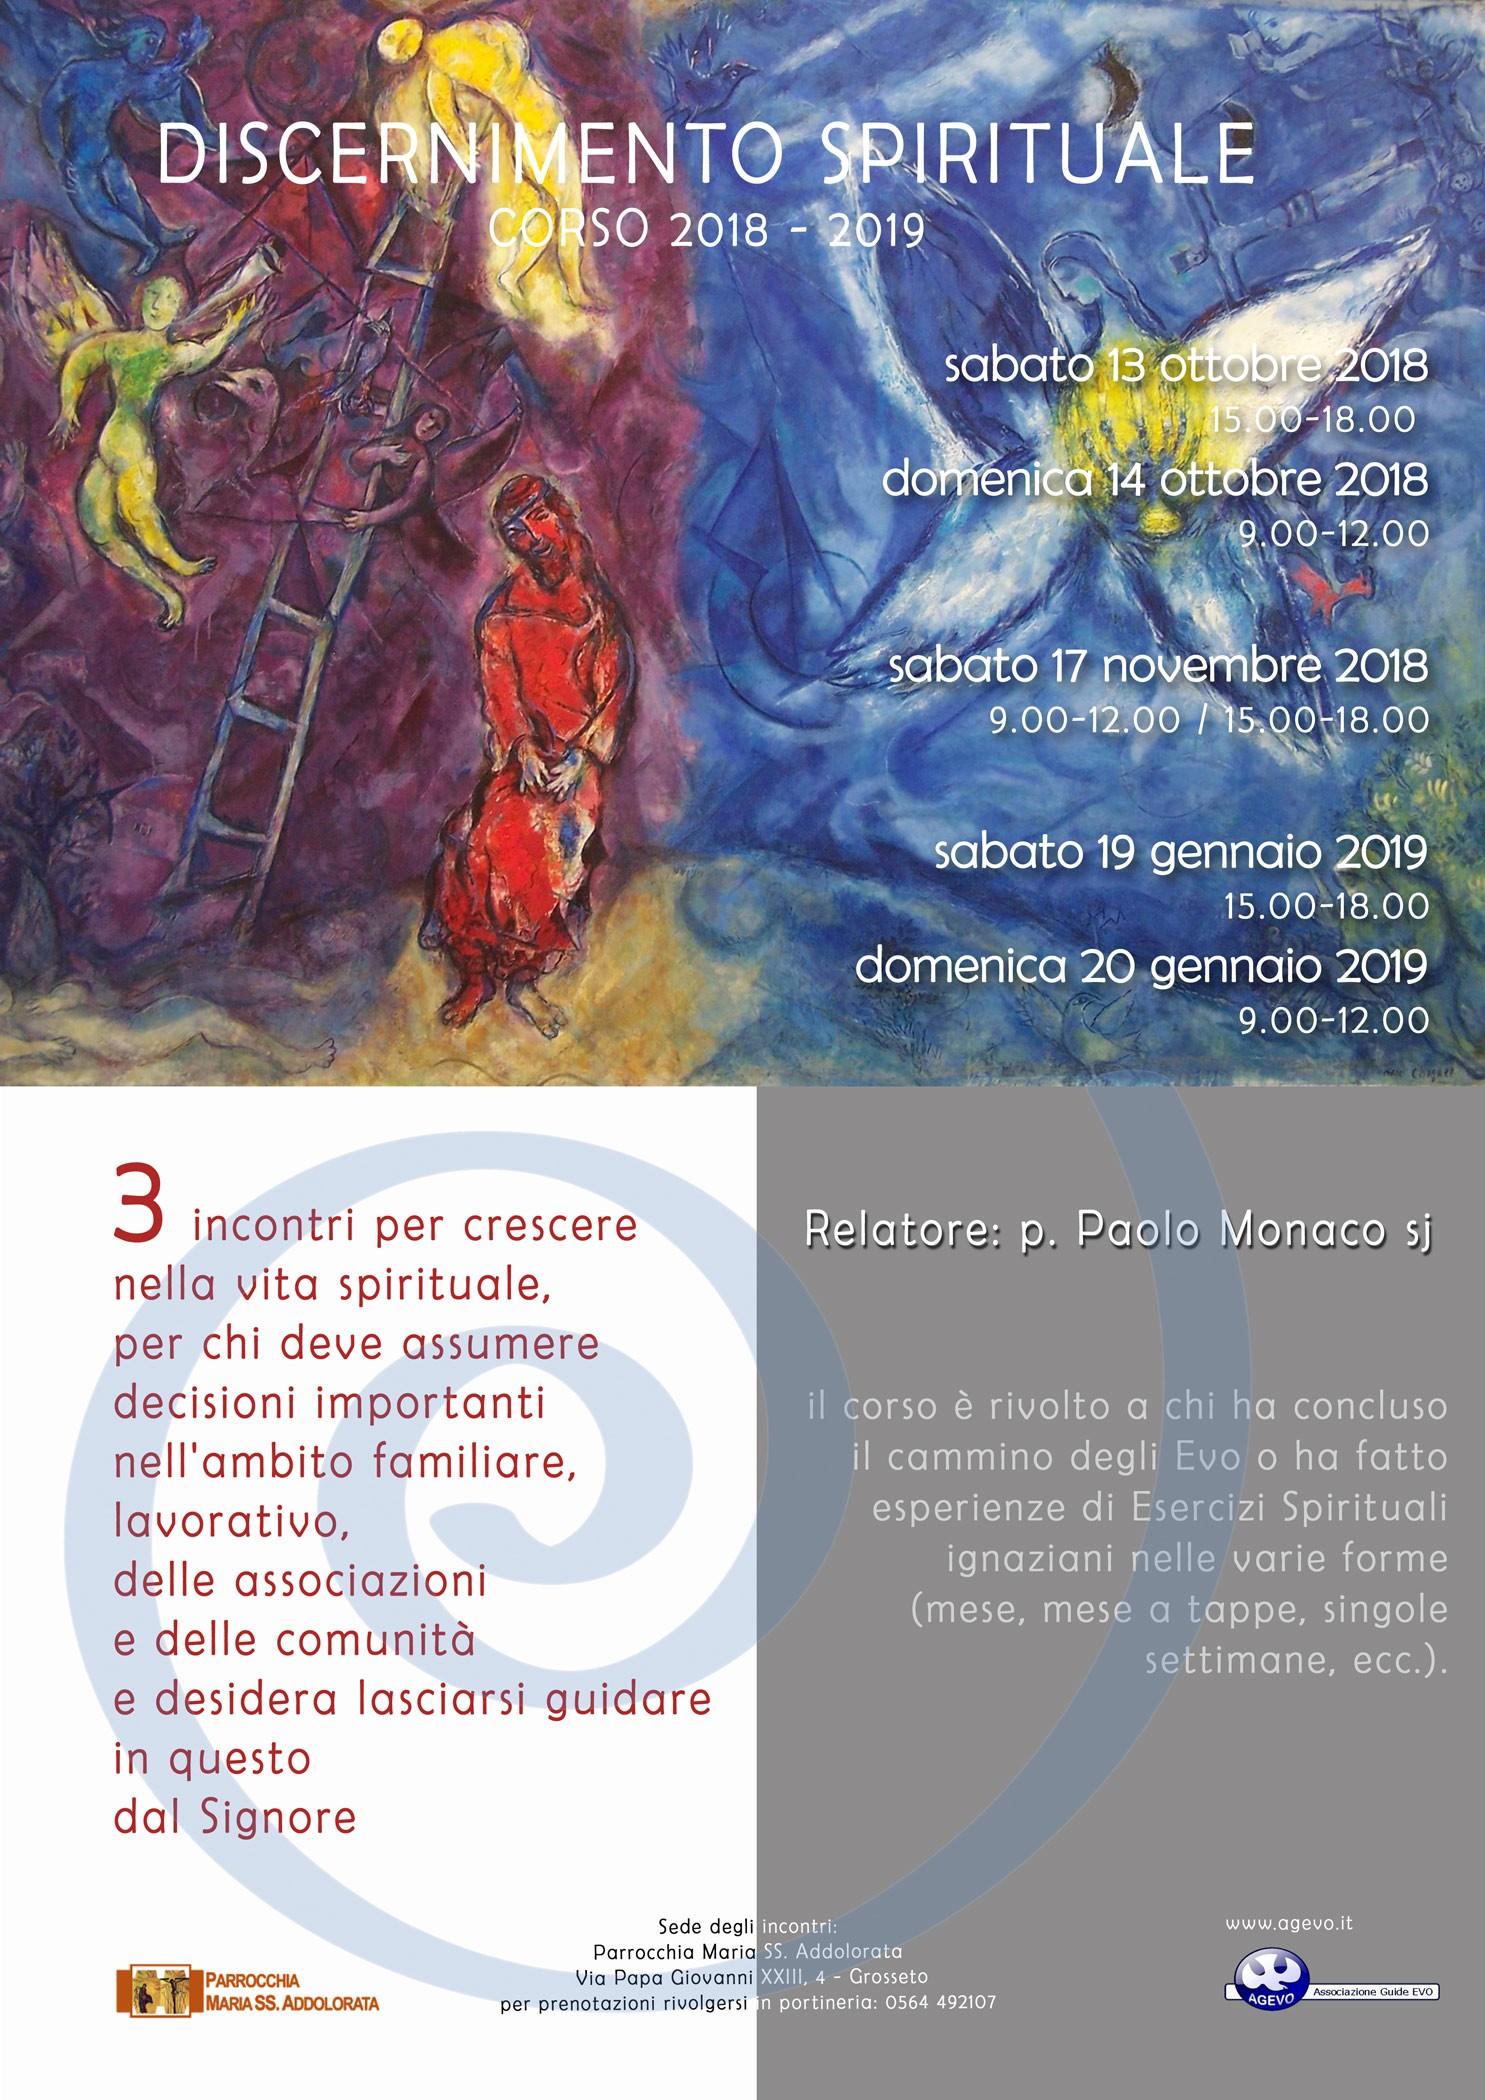 Calendario Liturgico 2019 Da Stampare Más Actual Discernimento